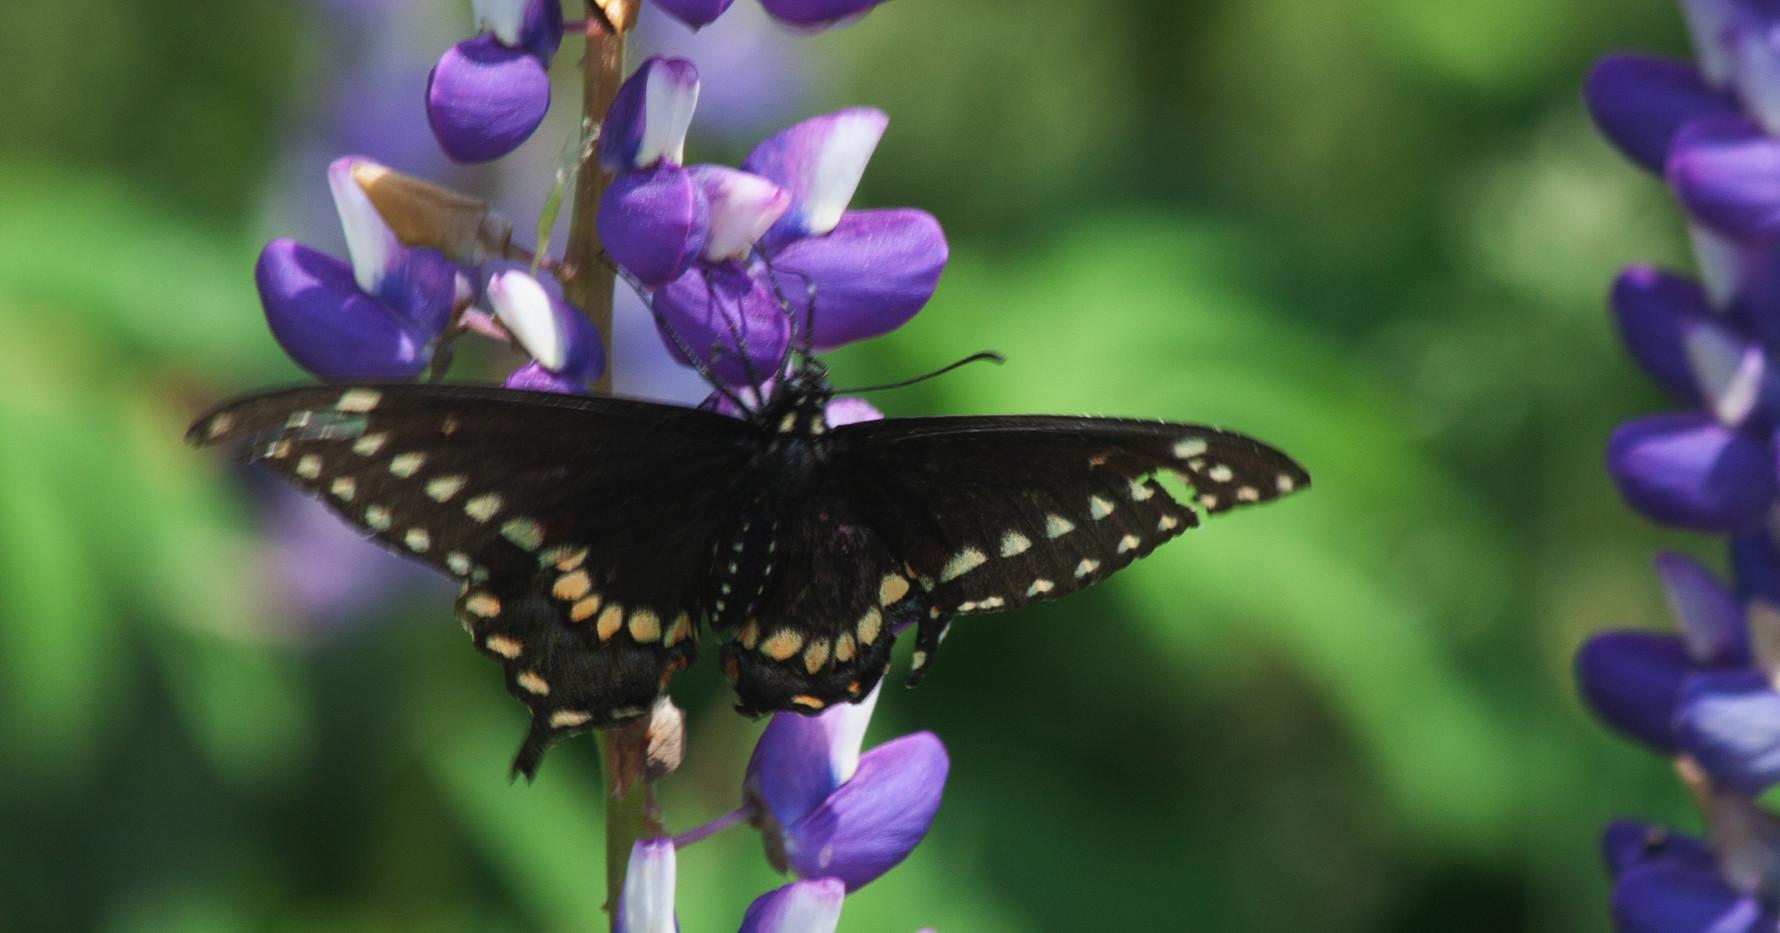 Eastern Black Swallowtail / Dorsal Side